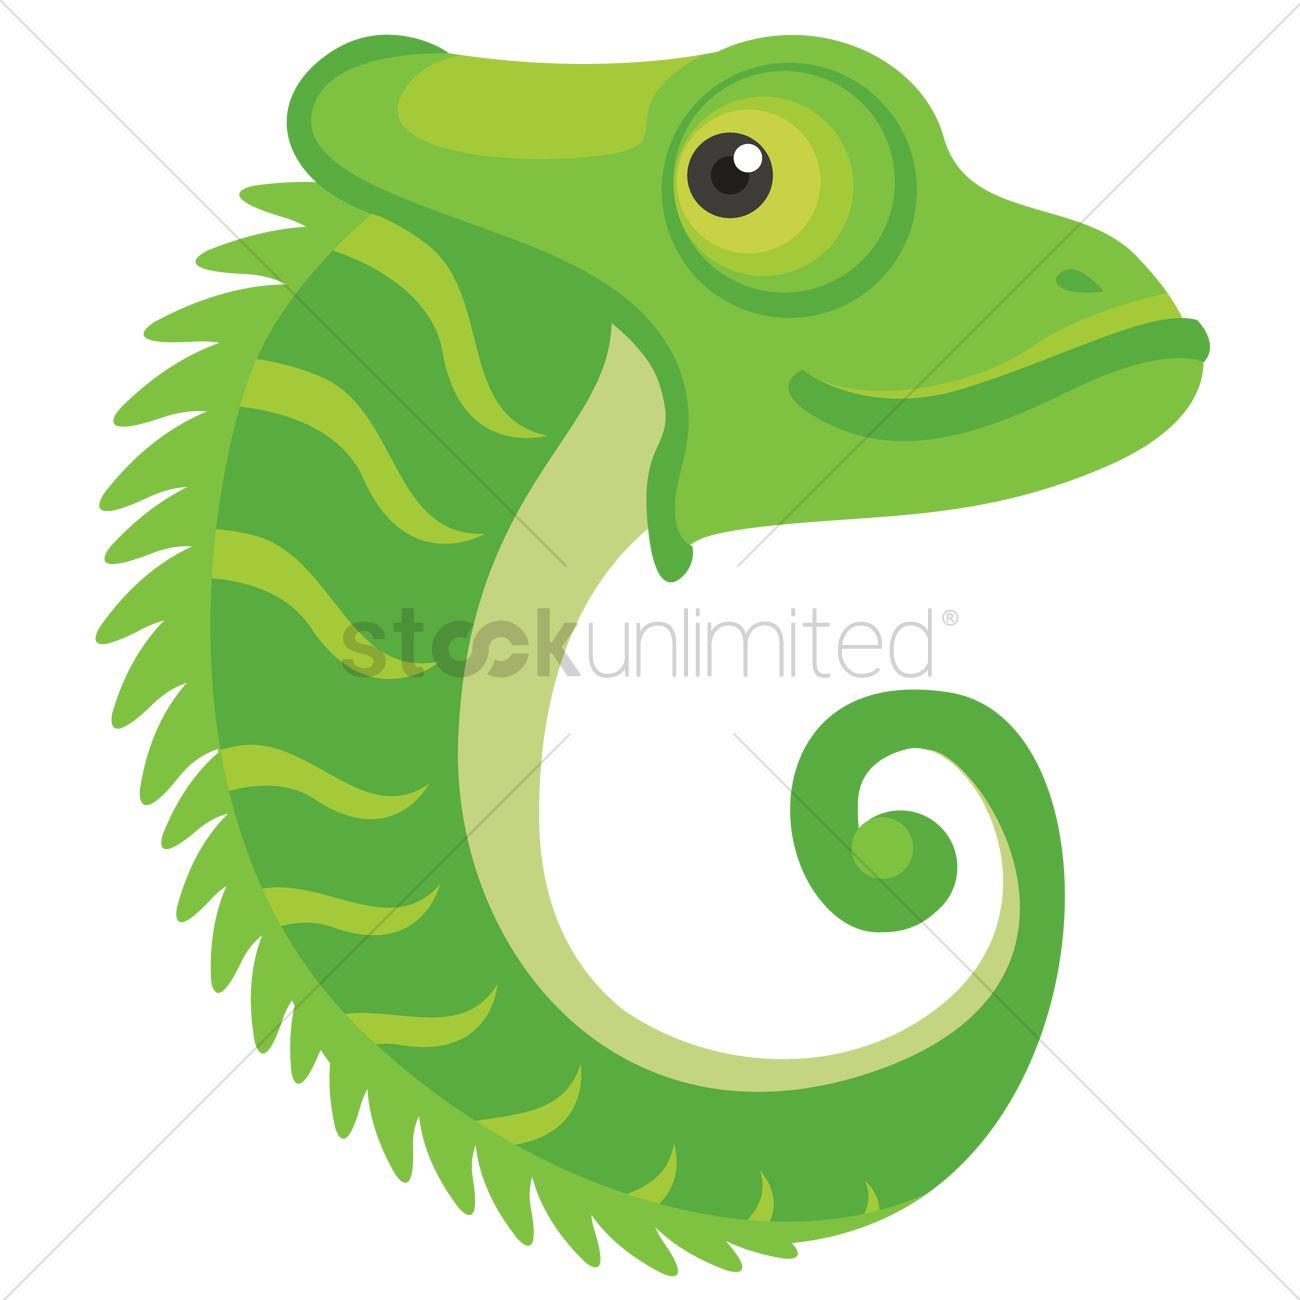 letter c for chameleon vector image - 1236502 | stockunlimited